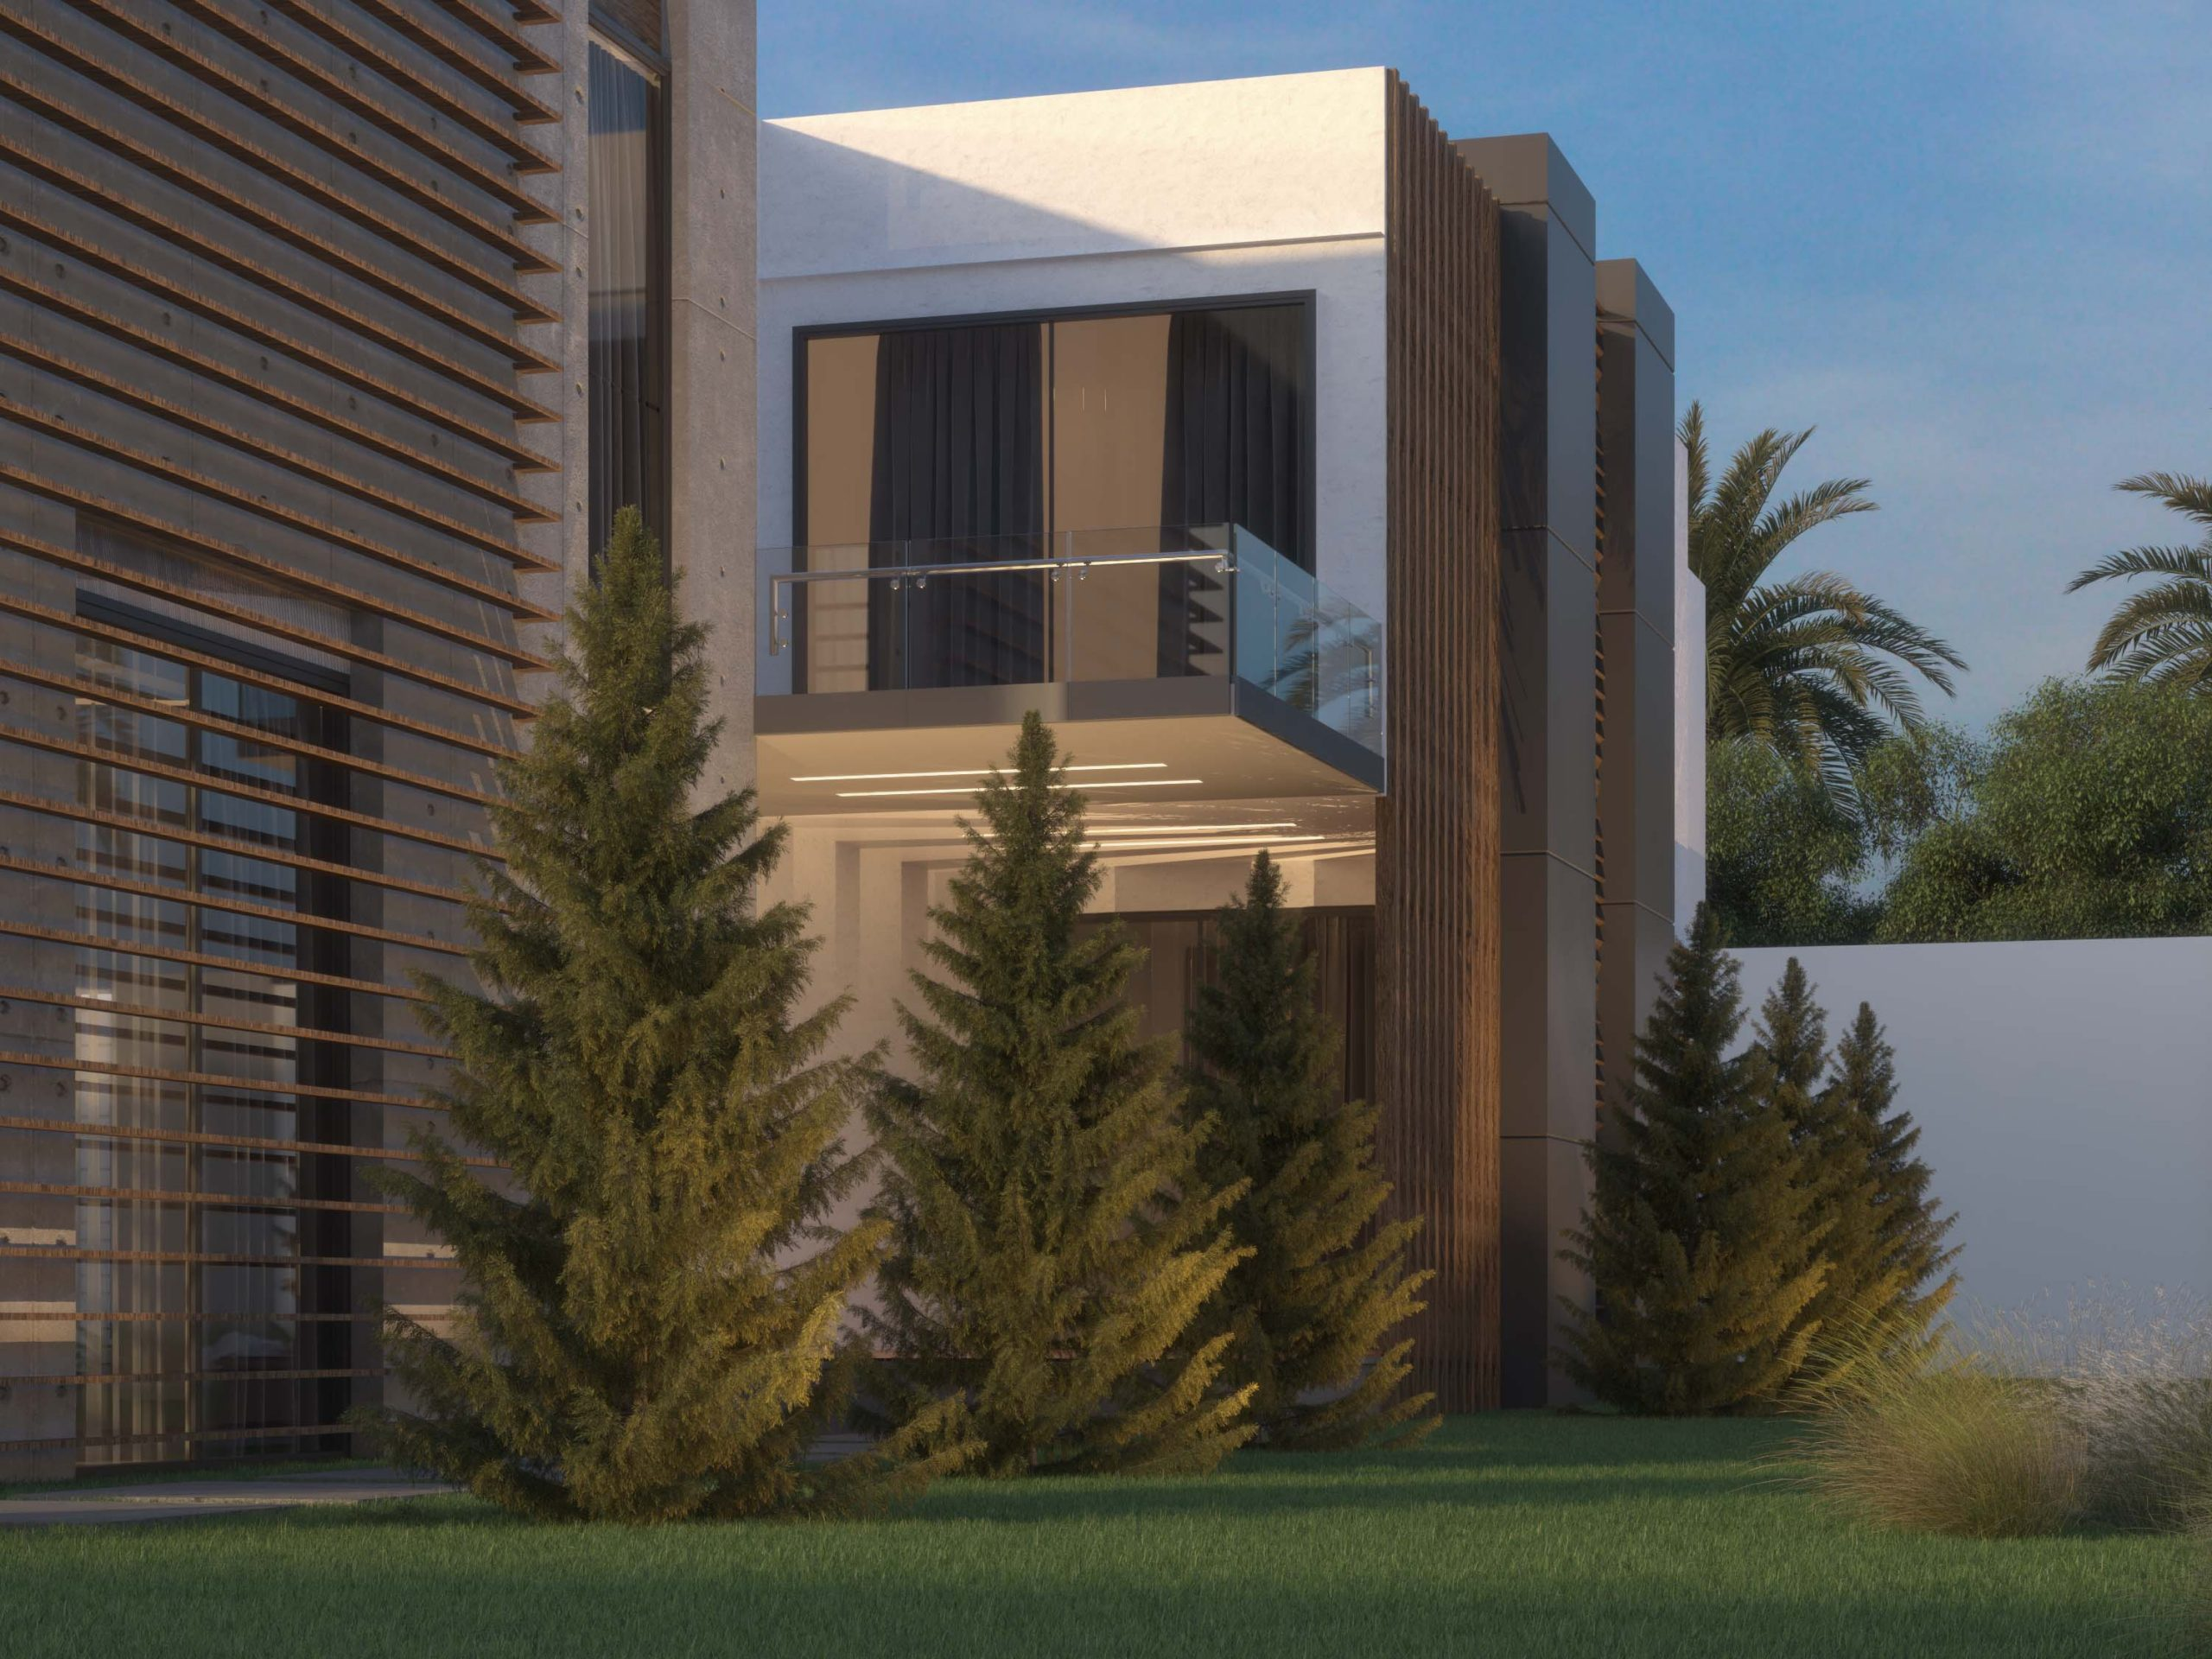 back yard - villa design - exterior design - balcony